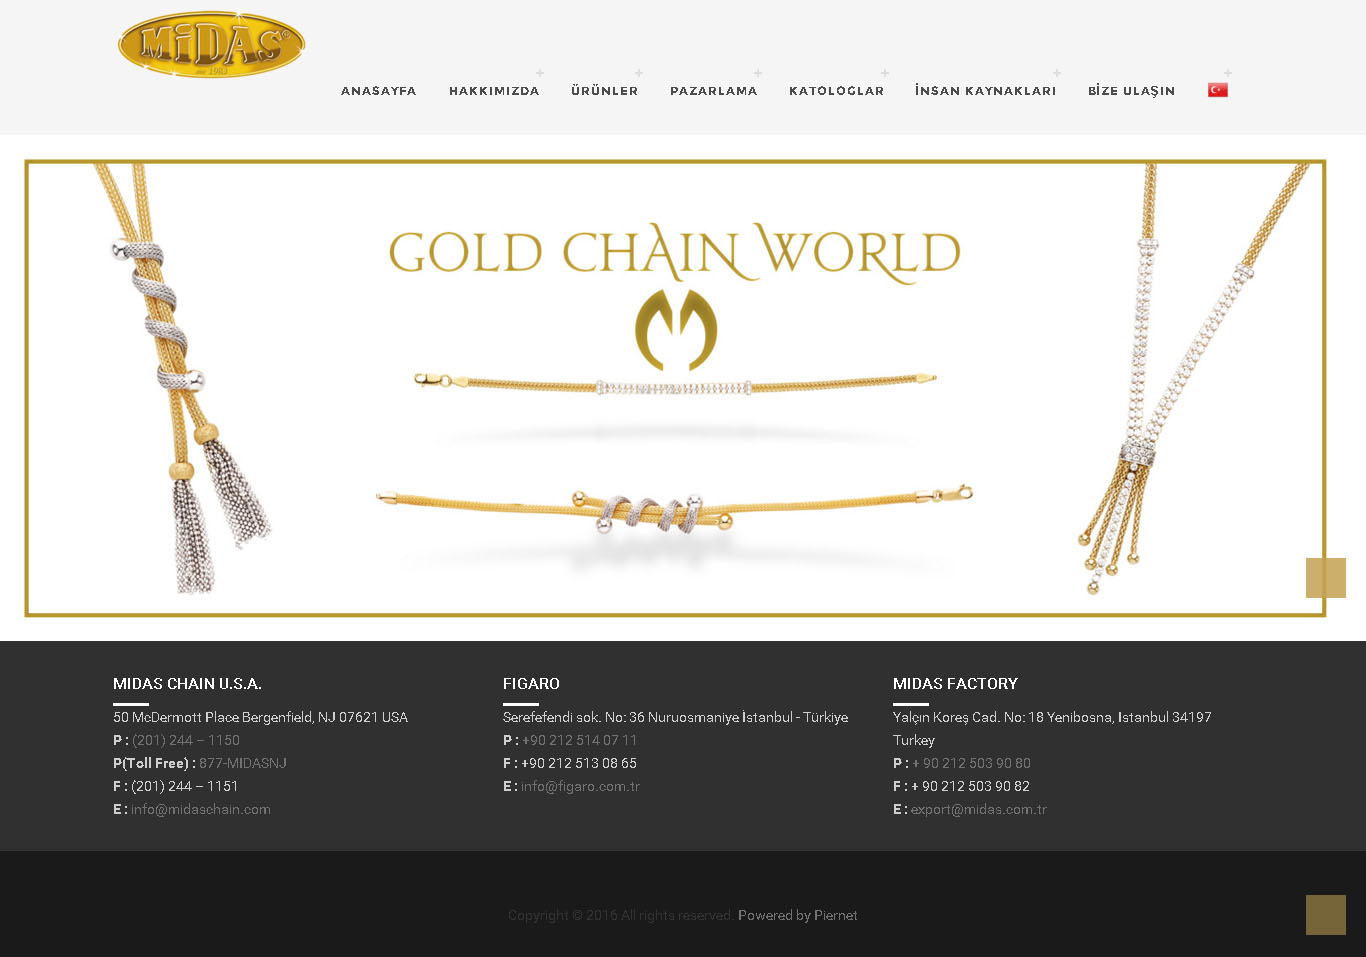 Midas Chain